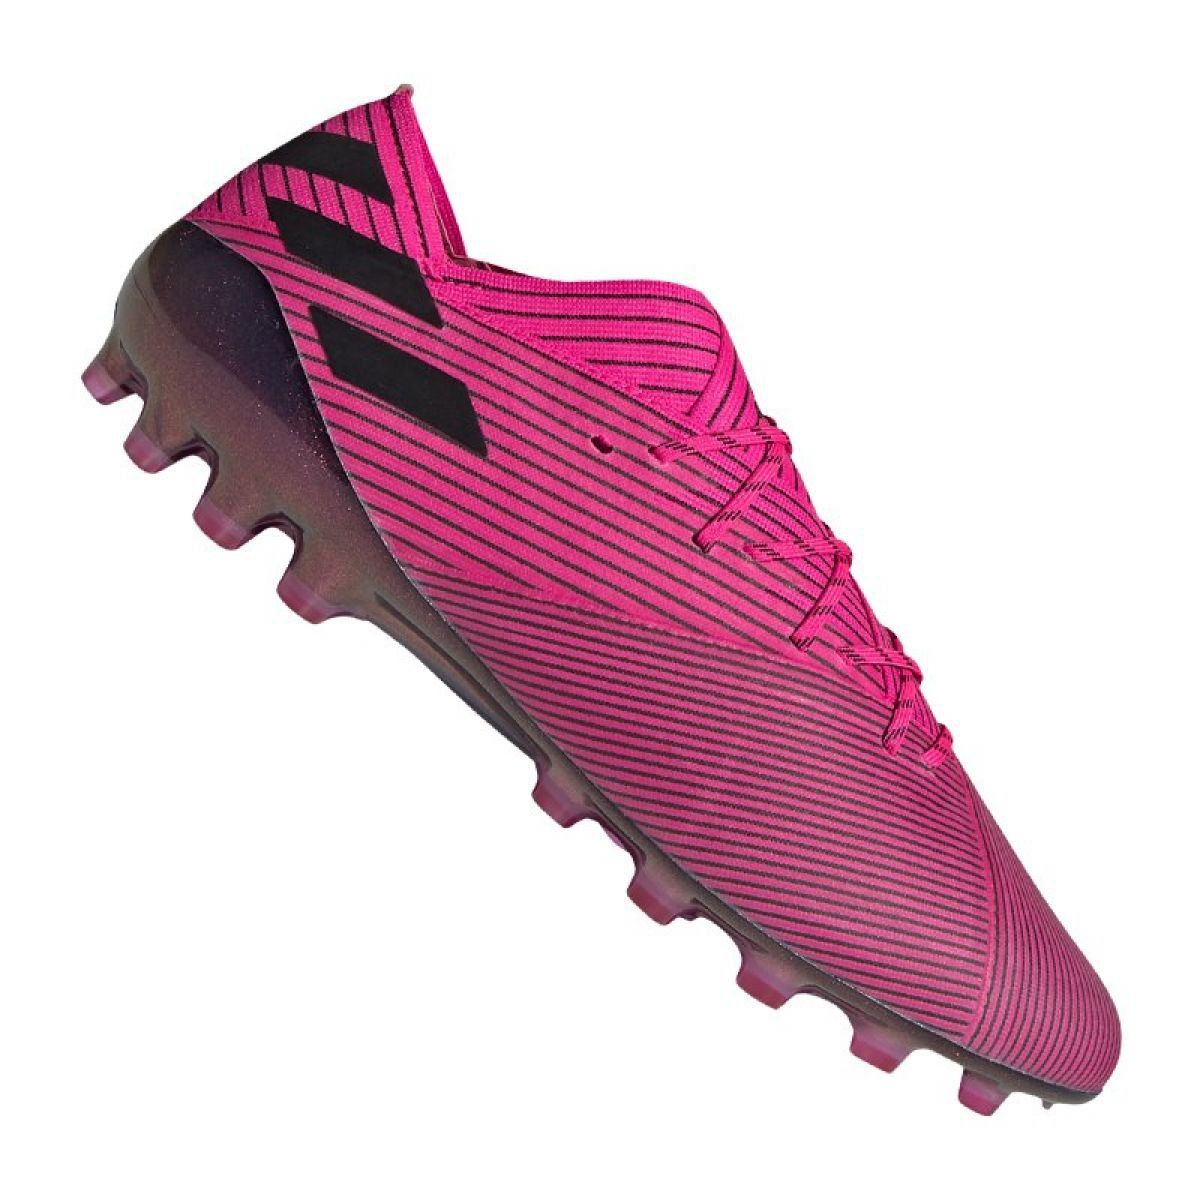 Buty Pilkarskie Adidas Nemeziz 19 1 Ag Fg M Fu7033 Rozowe Rozowe Football Shoes Shoes Adidas Football